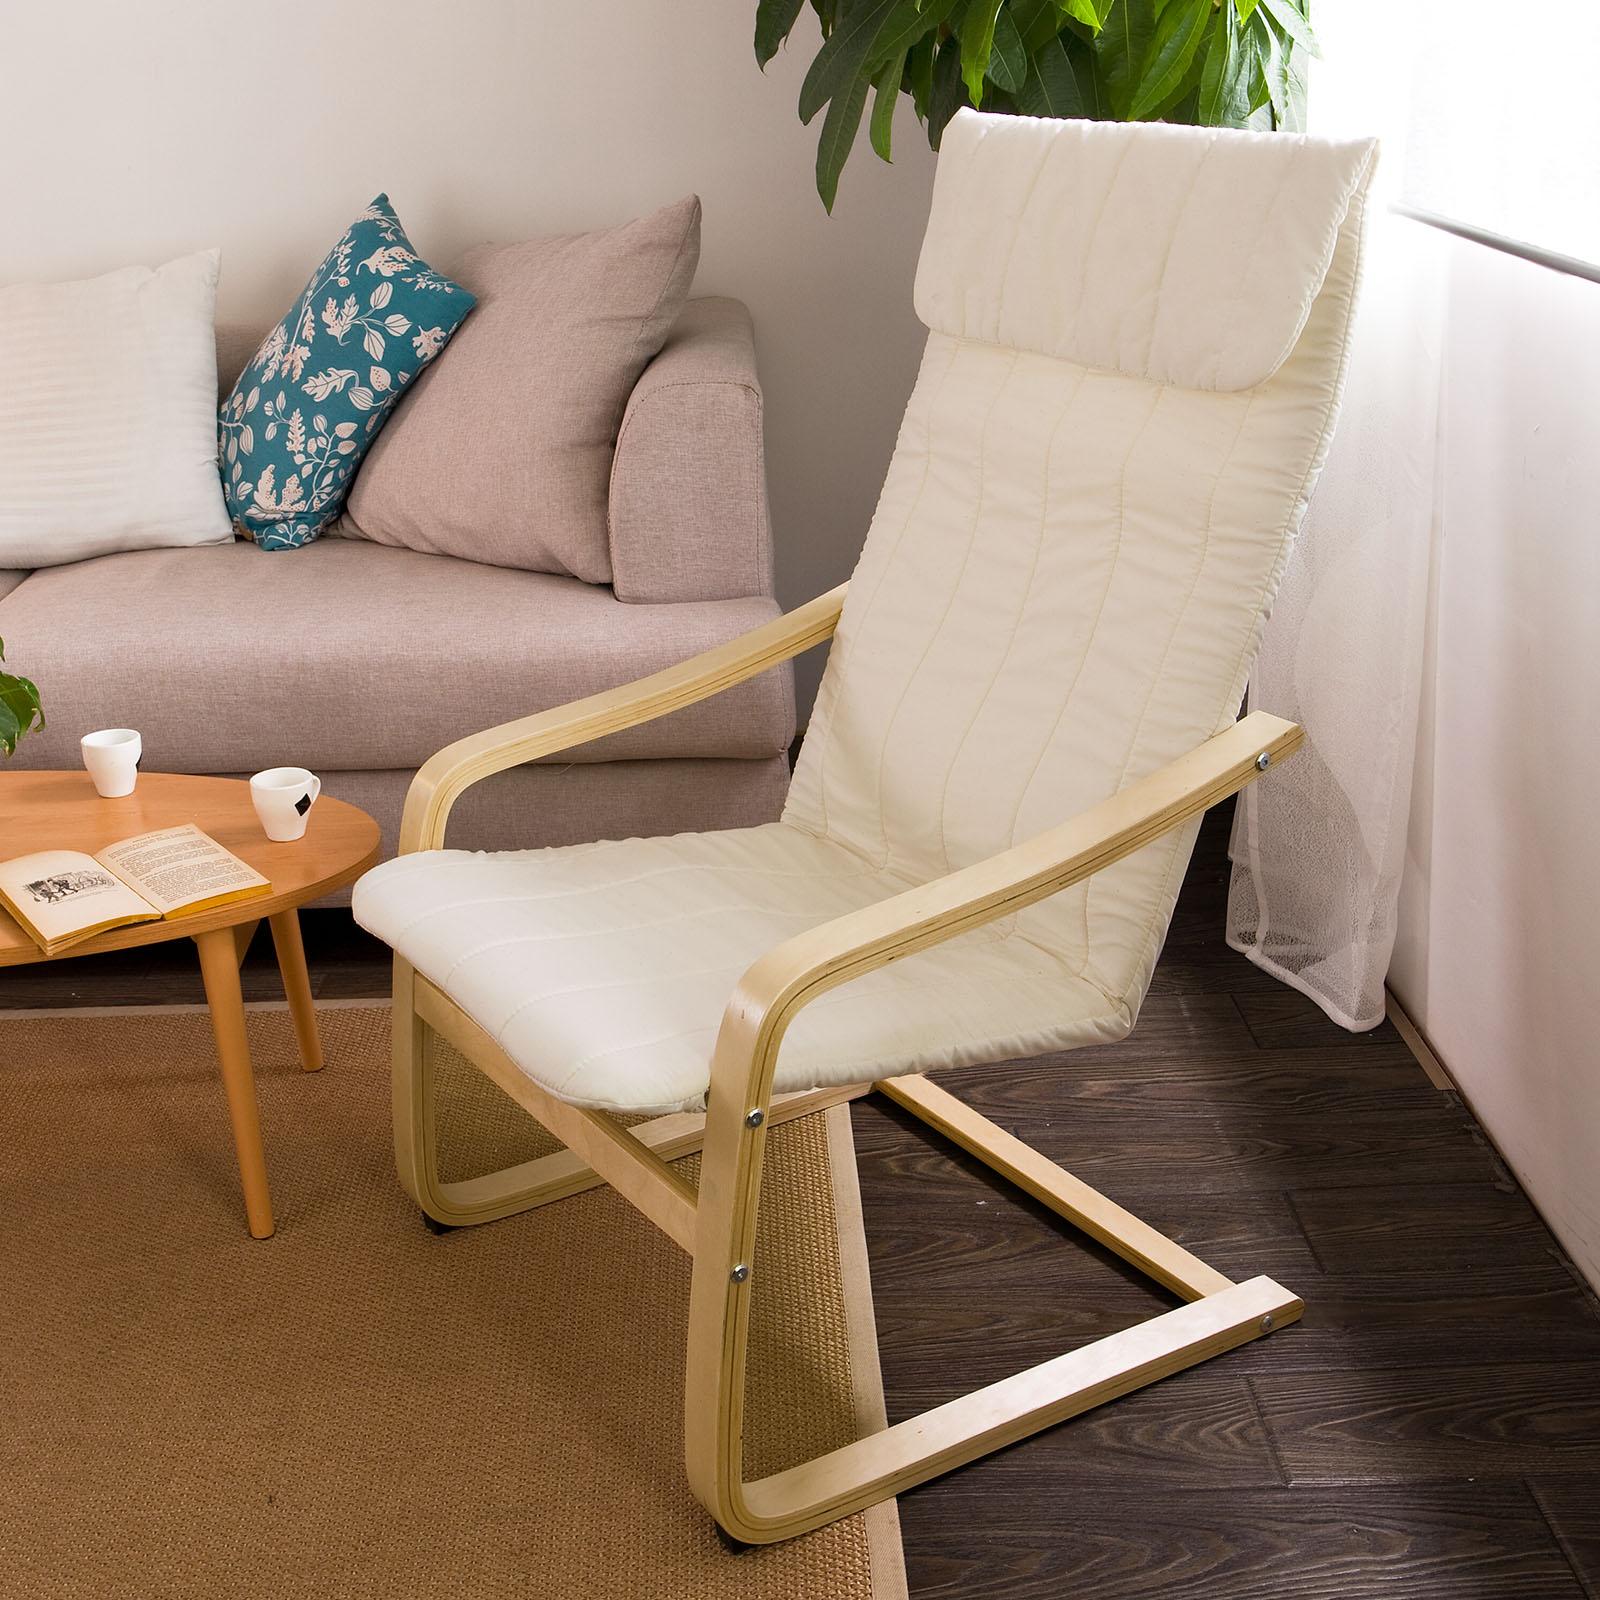 Genial Haotian FST17 W, Lounge Chair, Chair , Hammock,Bentwood Chair,White